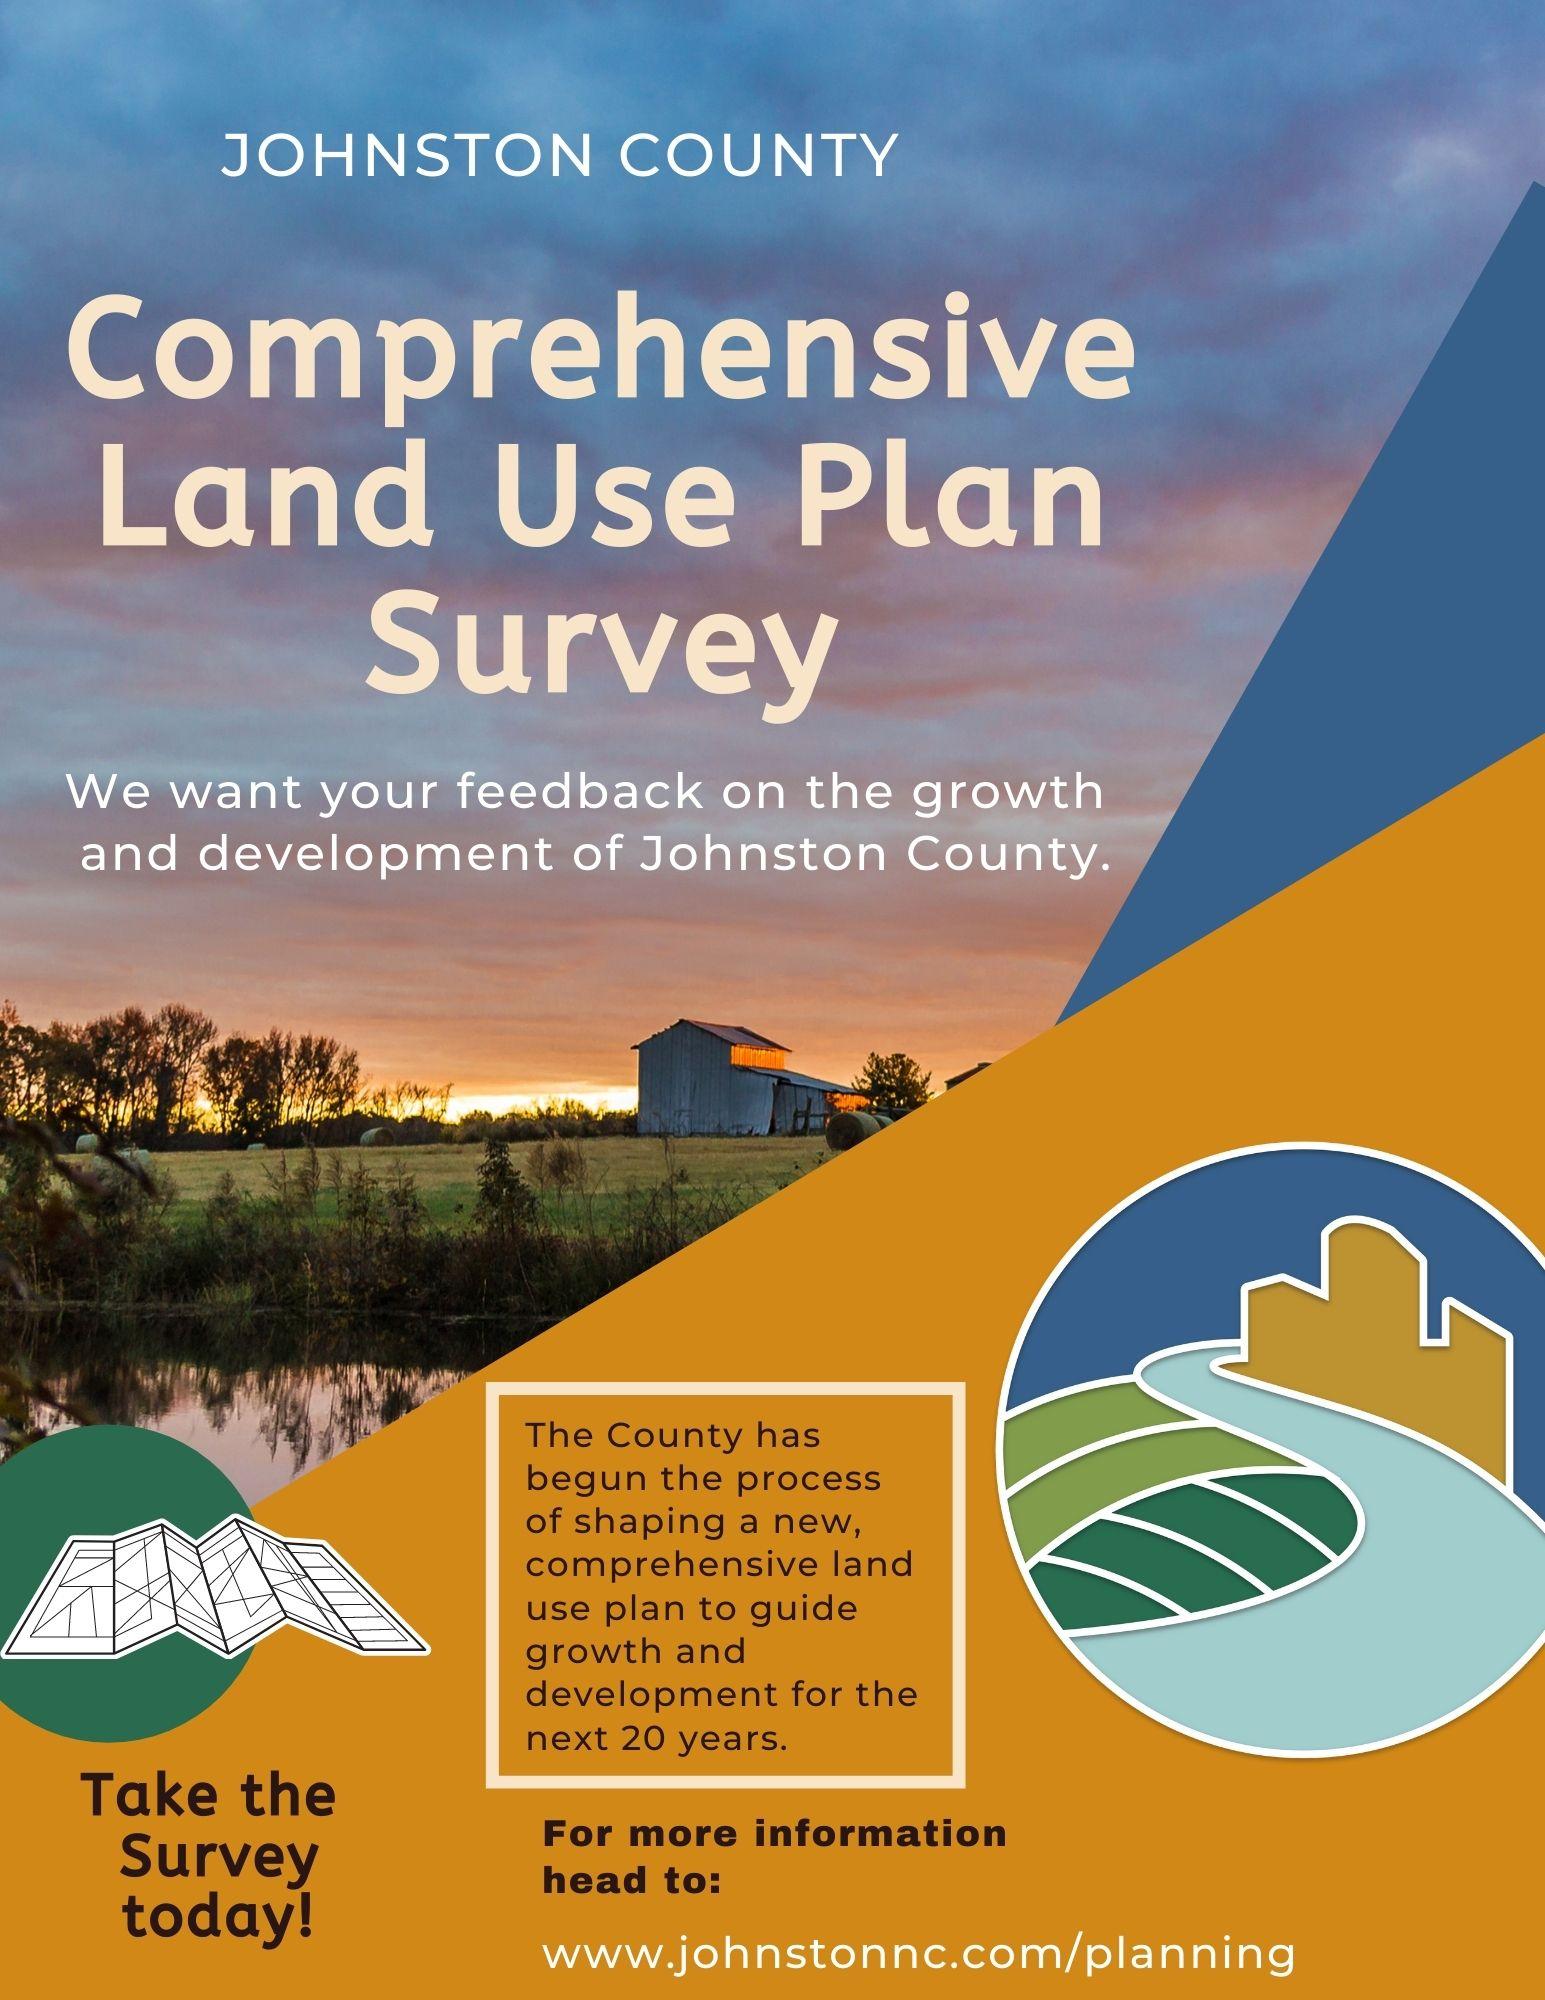 Johnston County Comprehensive Land Use Plan Flyer